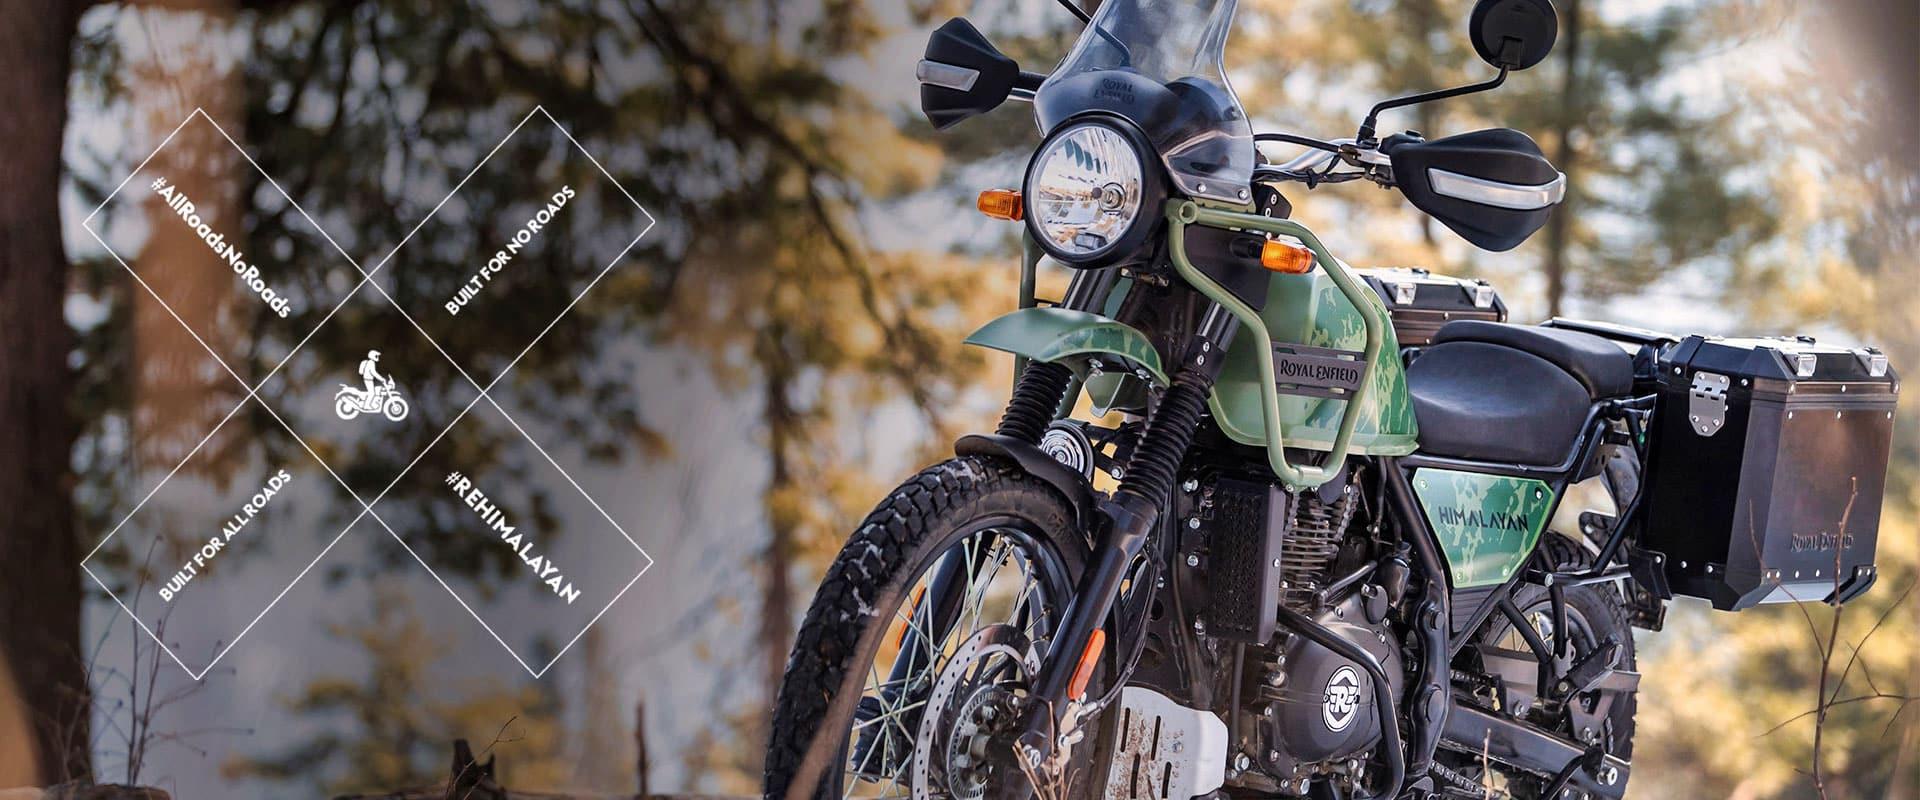 Royal Enfield Himalayan adventure bike